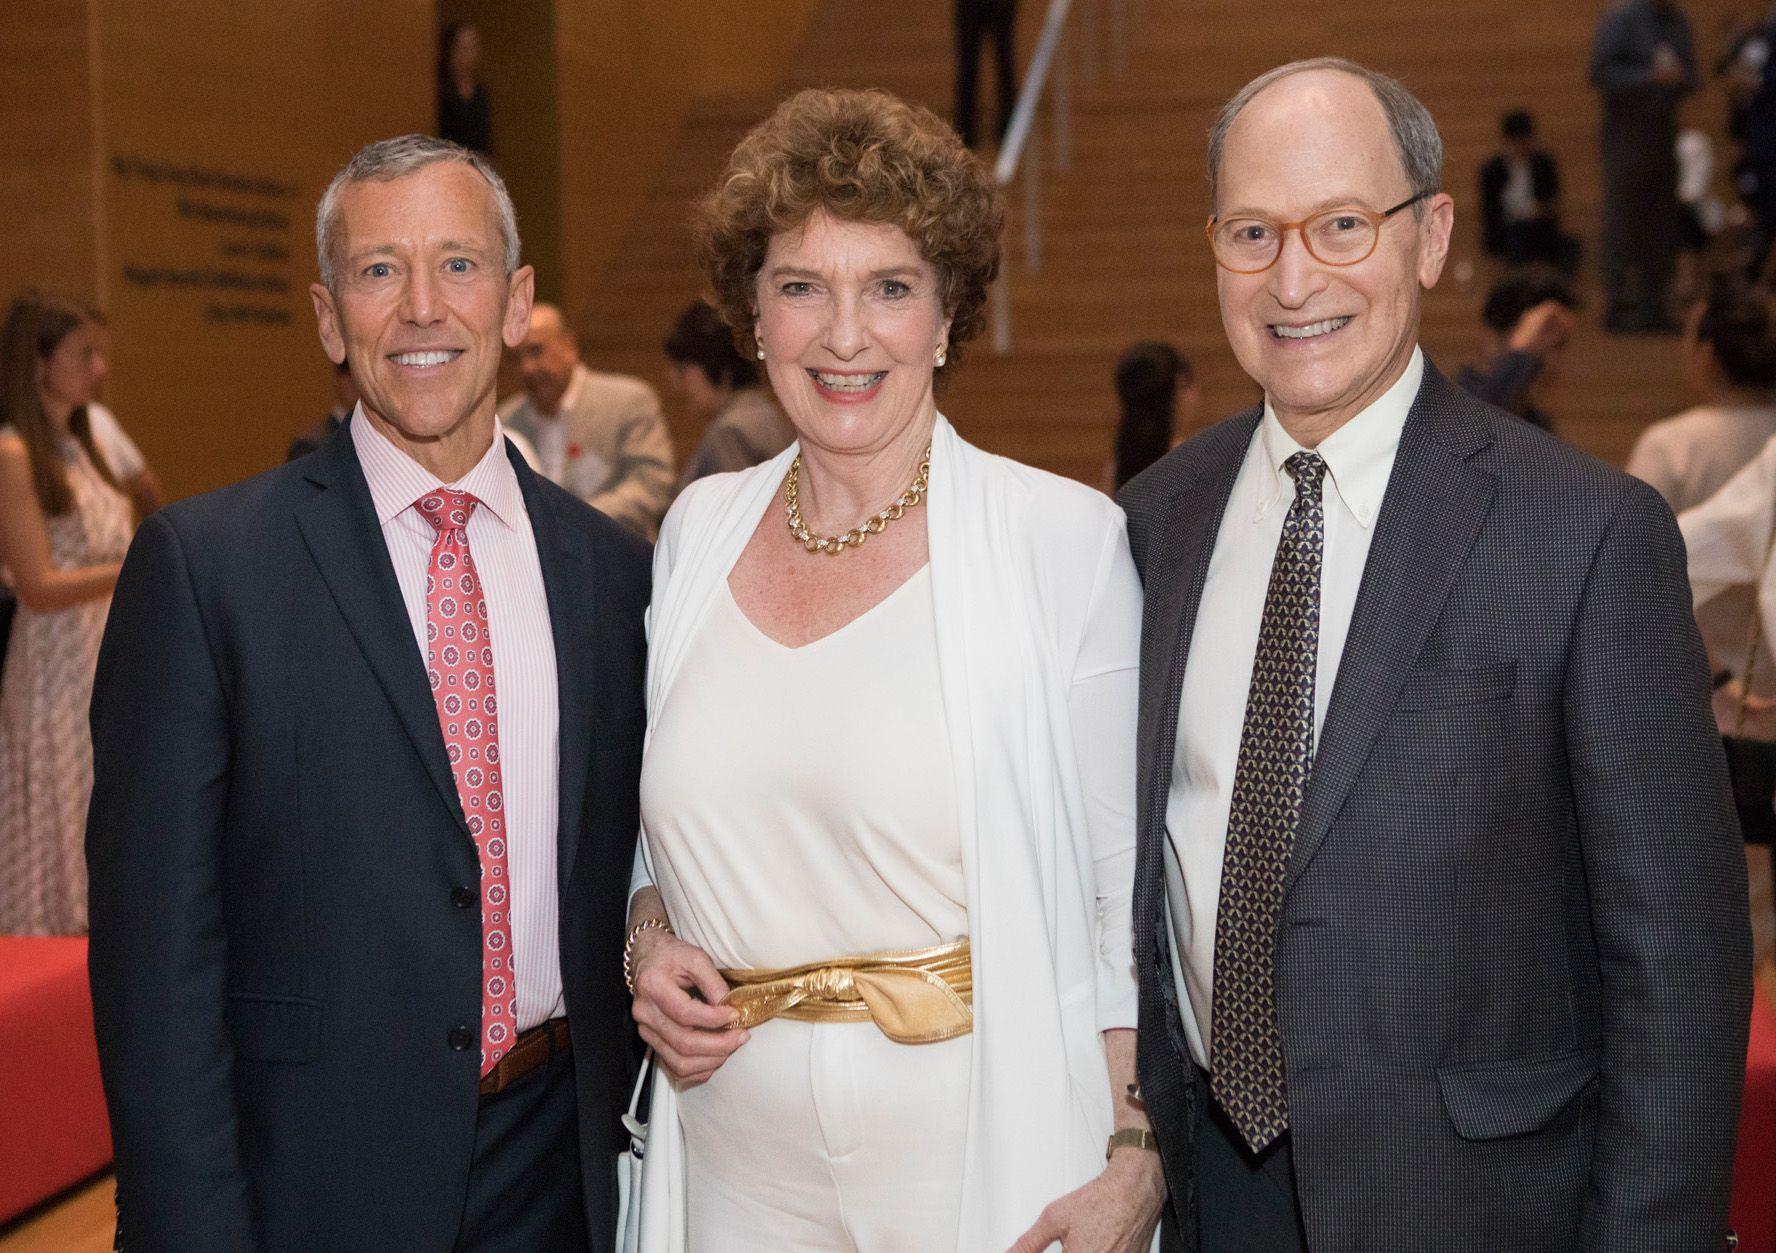 Richard Ditizio, Eileen Rockefeller Growald, Paul Growald